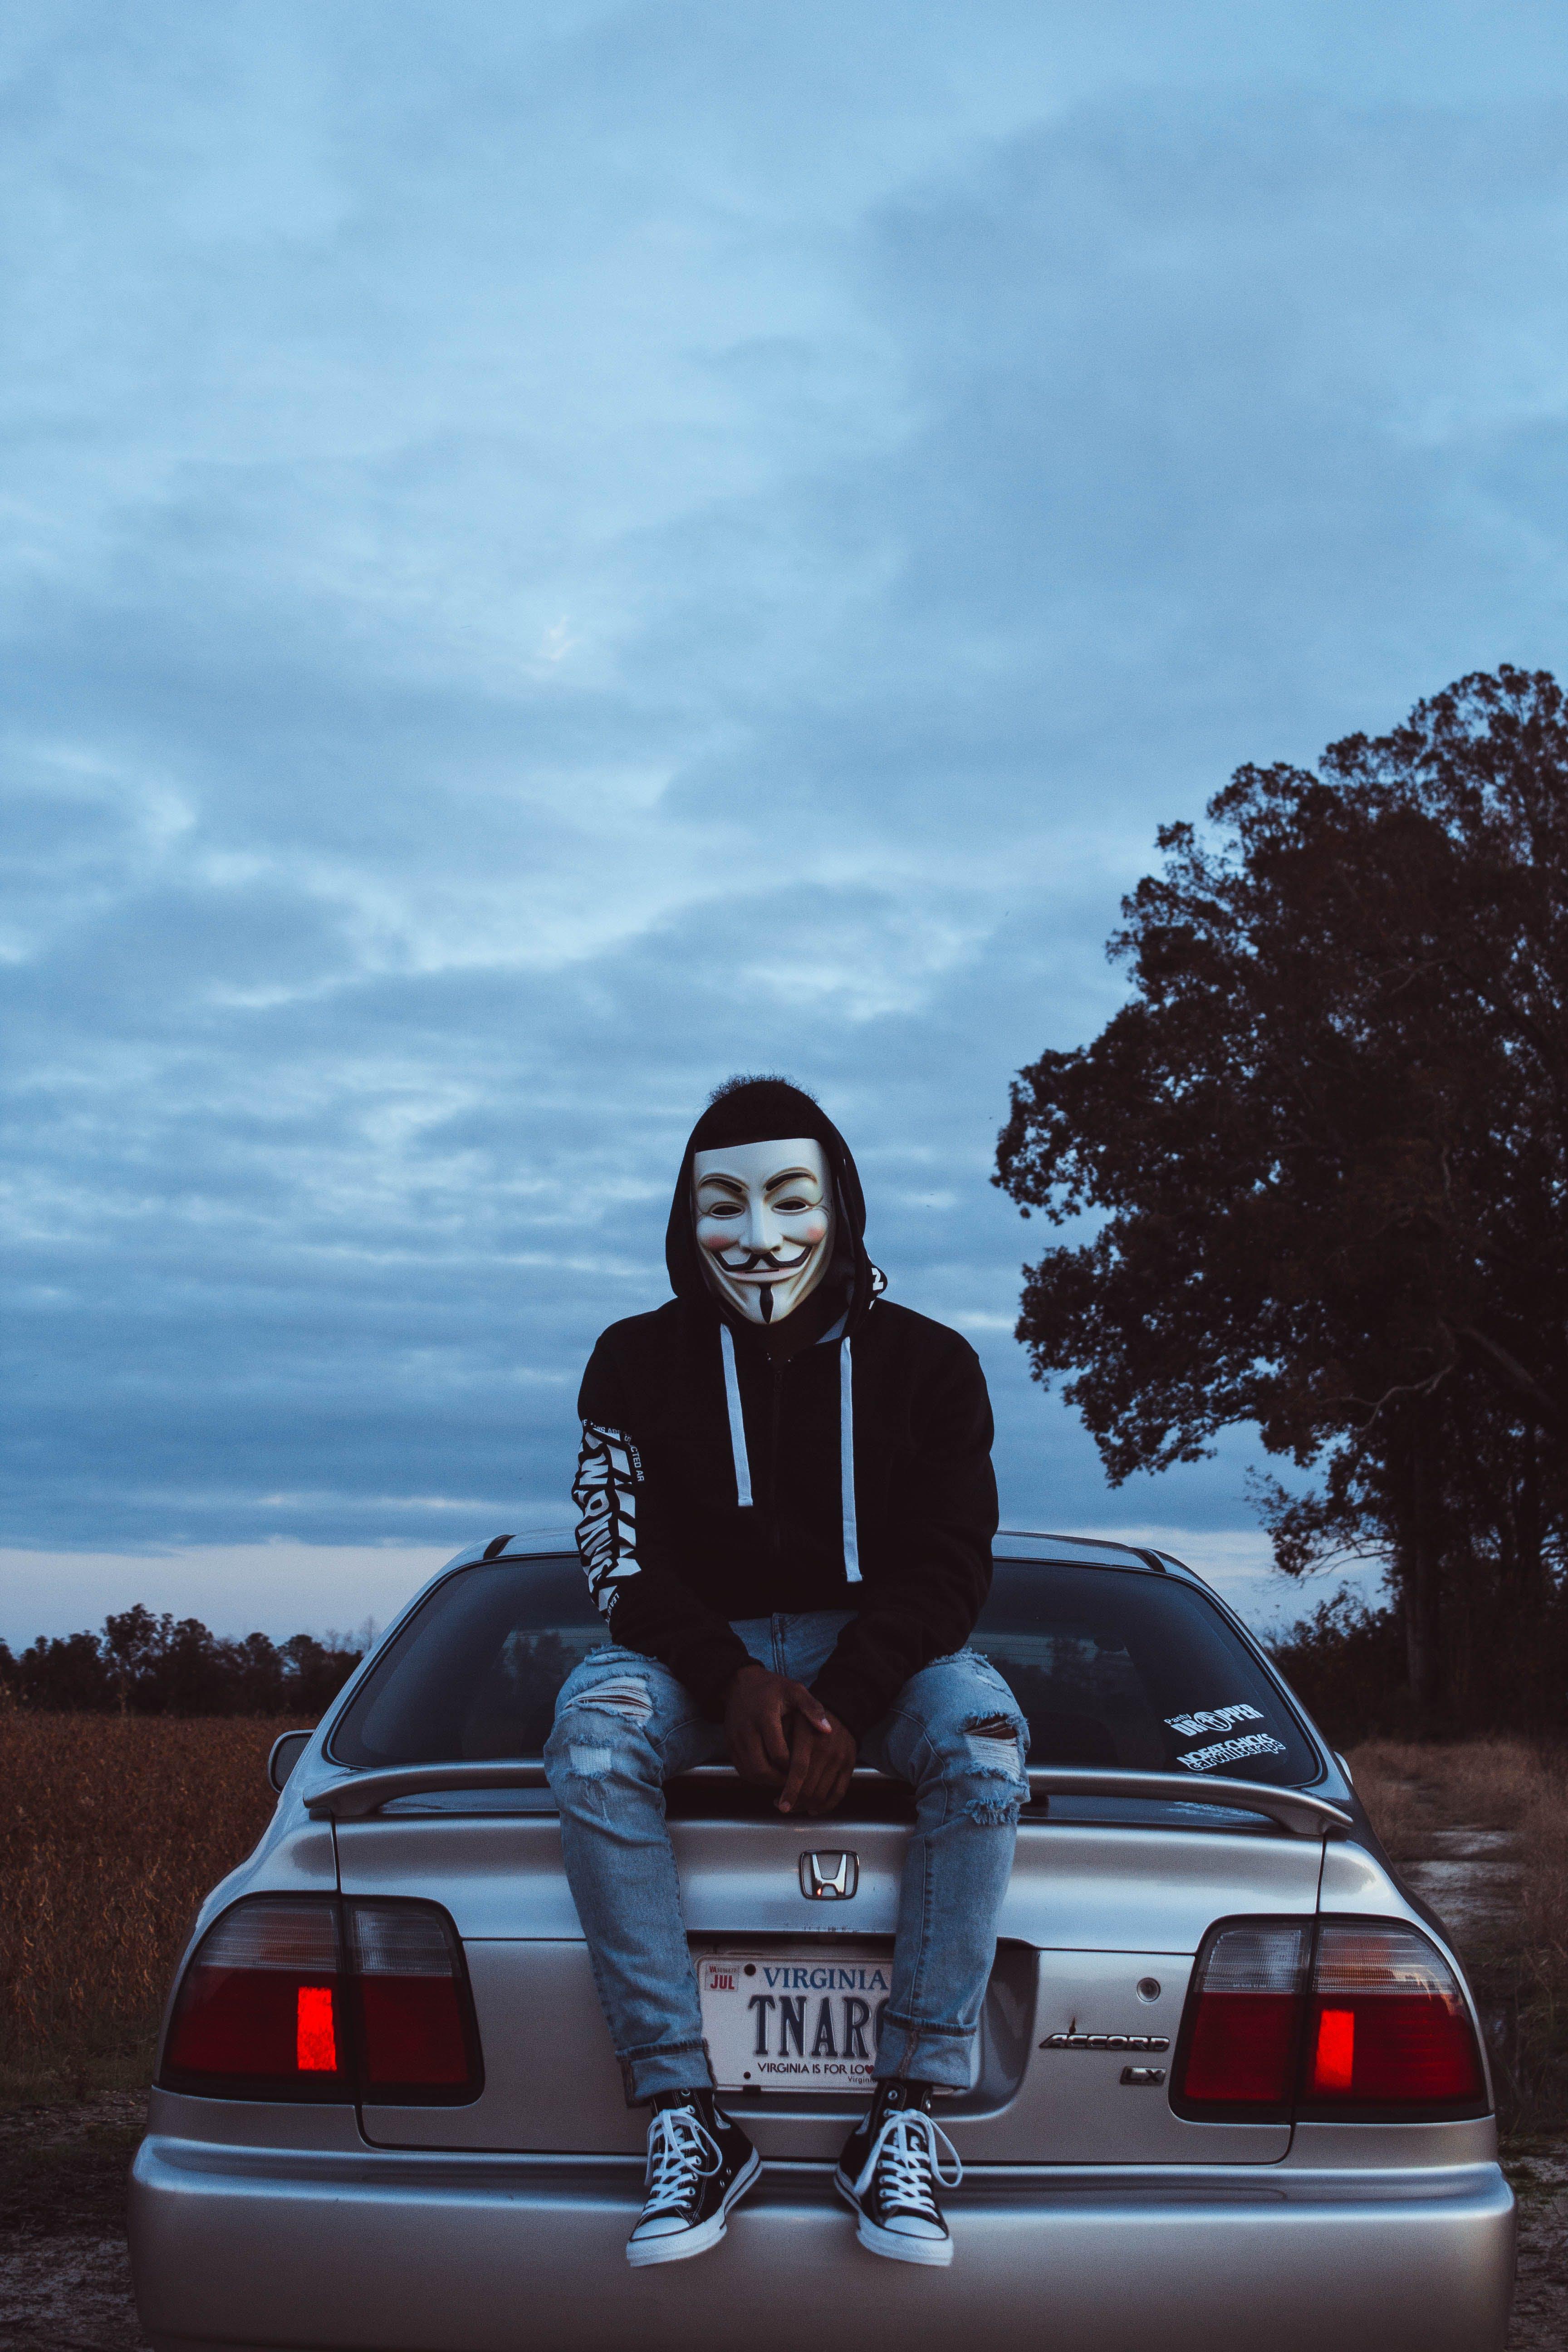 Man Wearing Guy Fawkes Mask While Sitting on Silver Honda Civic